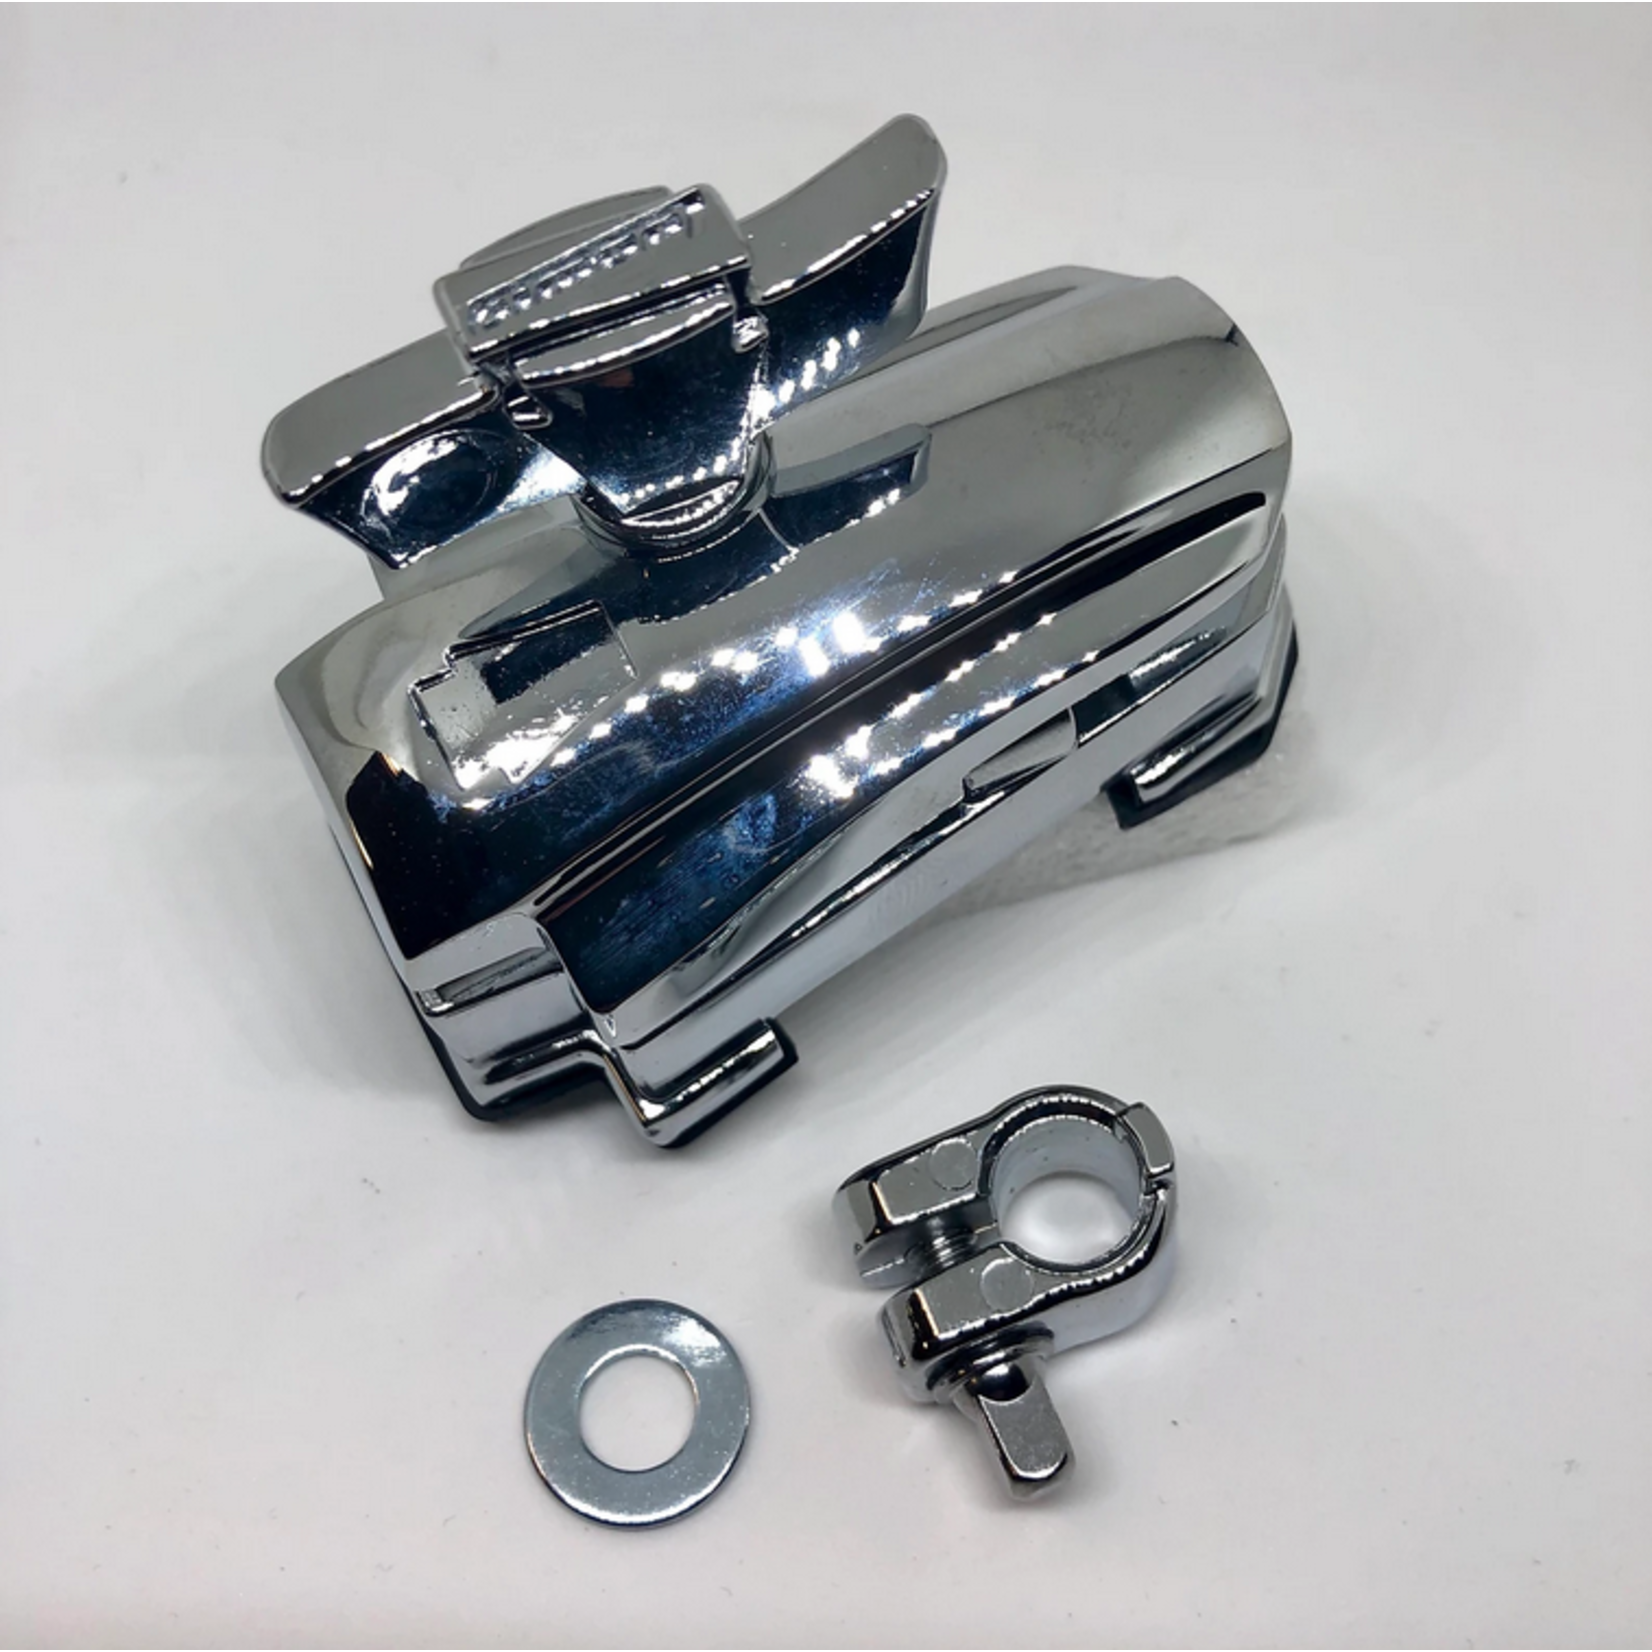 Ludwig LUDWIG KEYSTONE TOM BRACKET 10.5mm P7202AP